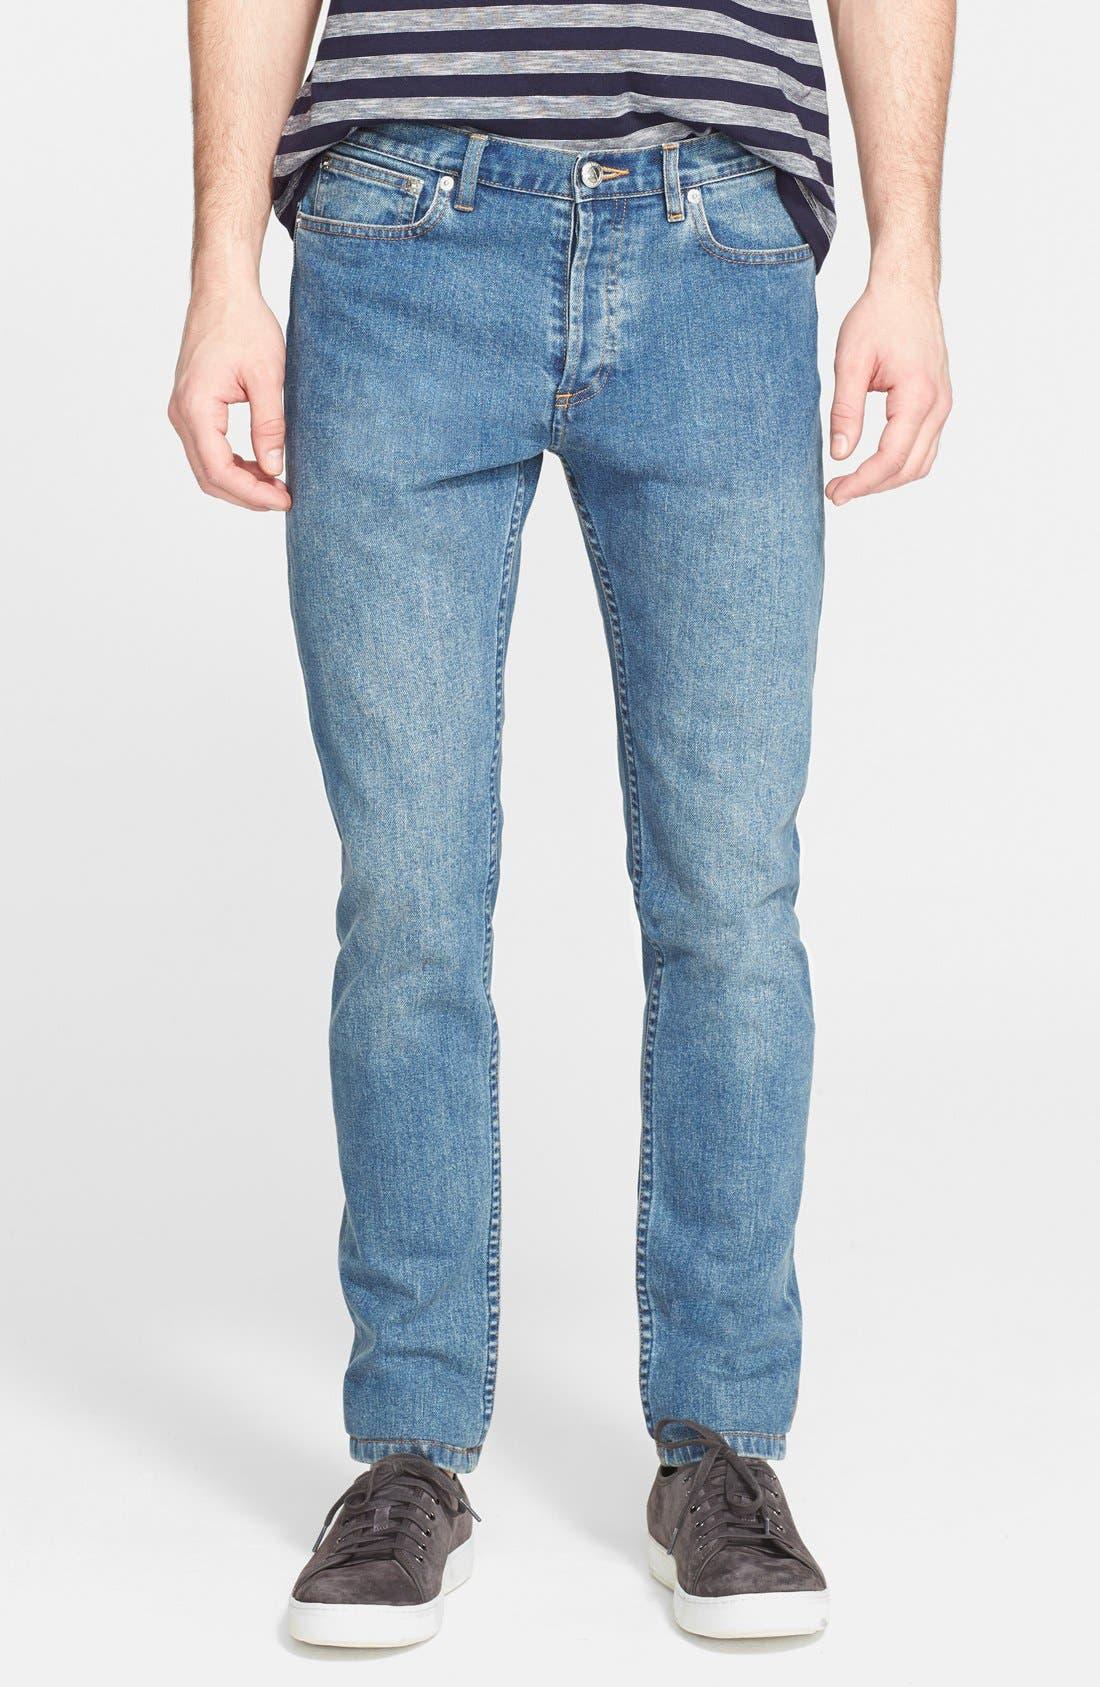 A.P.C. 'Petit New Standard' Skinny Fit Jeans (Indigo)